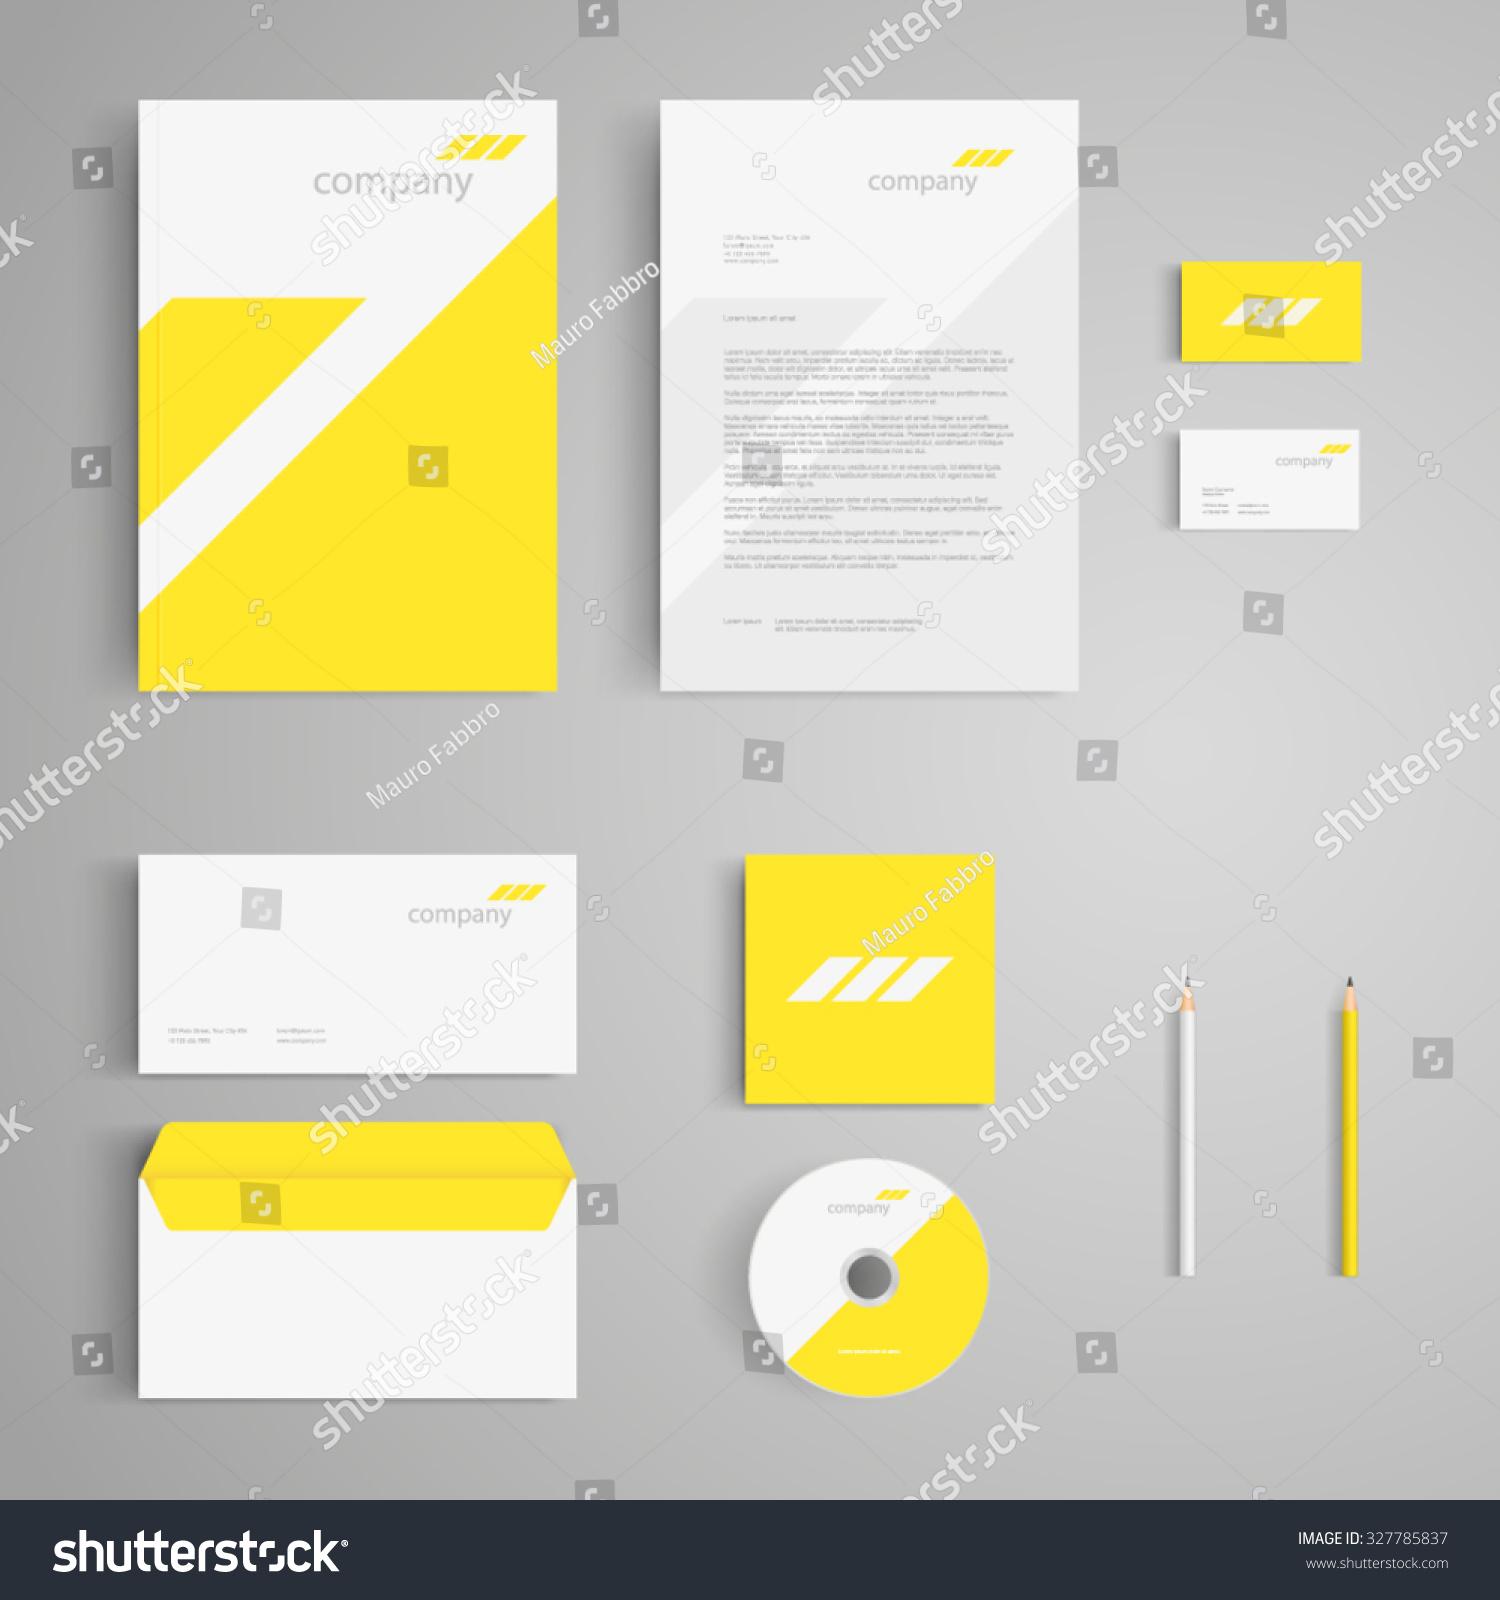 Eps Corporate Letterhead Template 000105: Stationery Template Logo Corporate Identity Company Stock